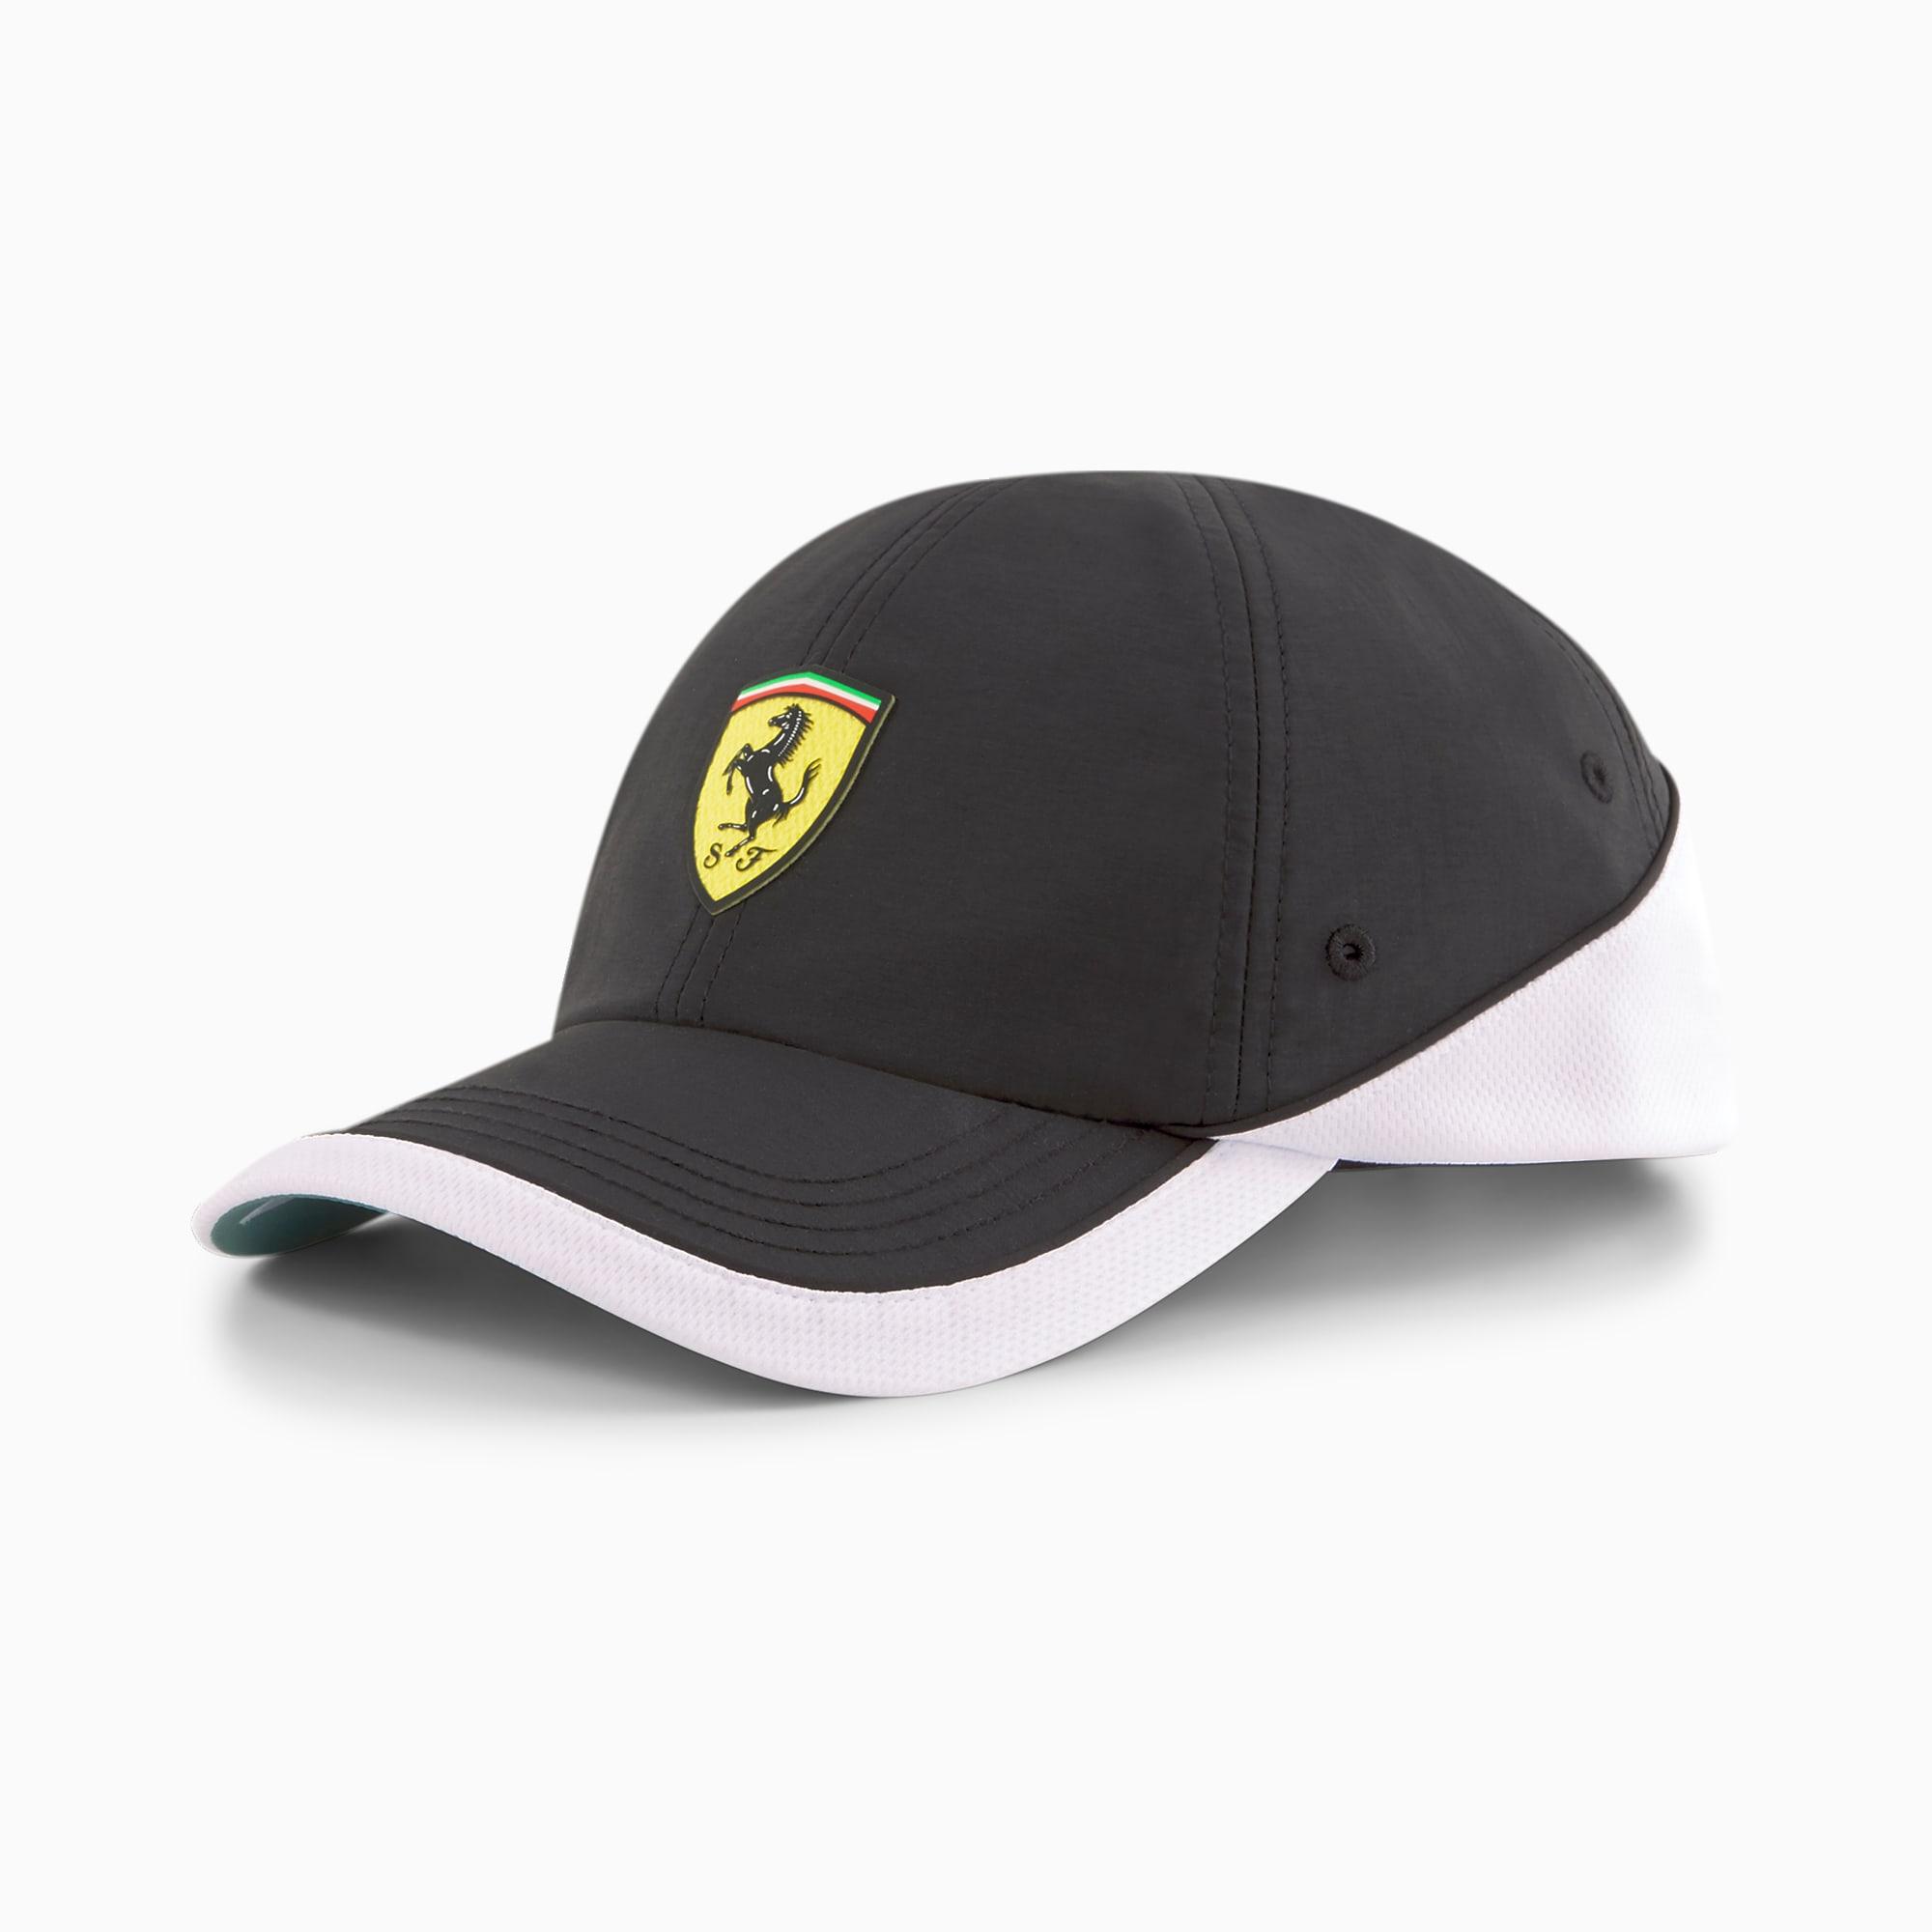 Casquette de baseball Scuderia Ferrari, Noir, Accessoires - PUMA - Modalova